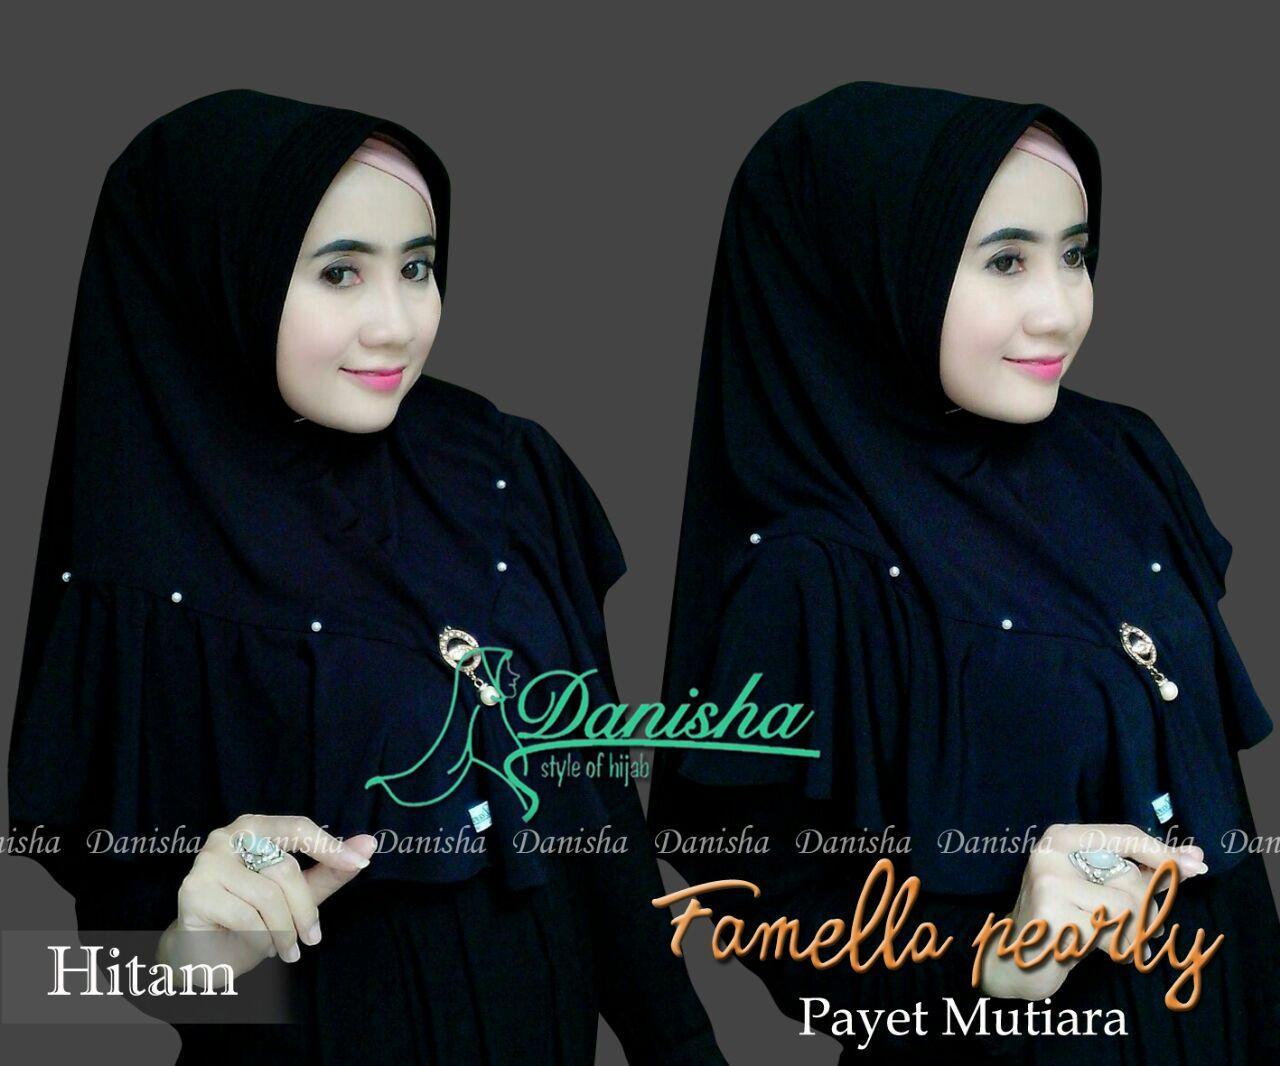 Hijab Famella Pearly Original By Danisha umadera